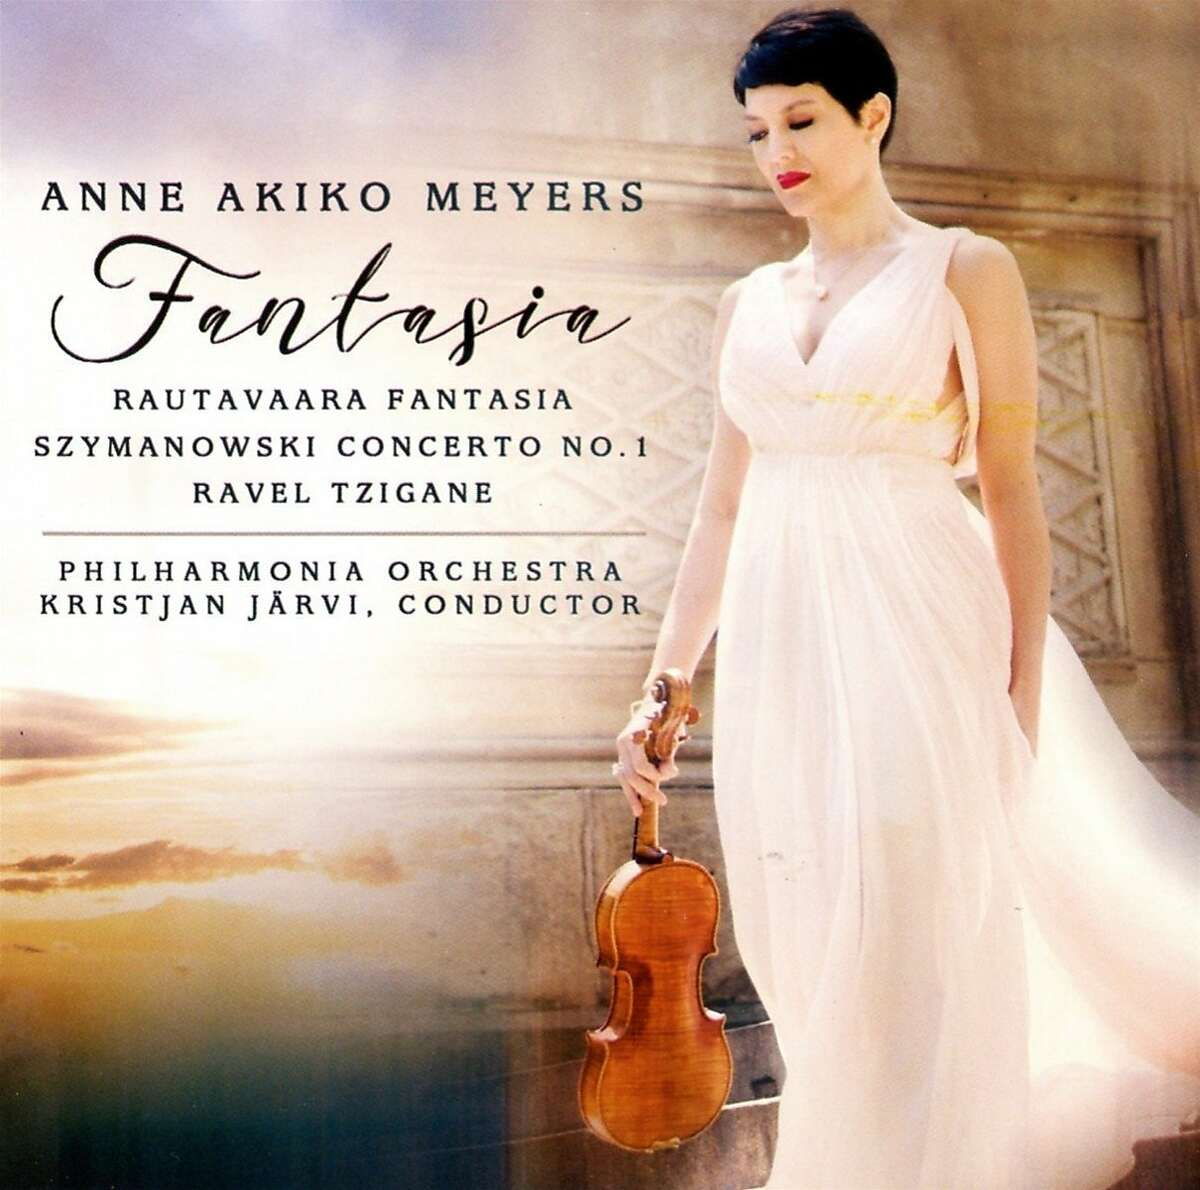 Anne Akiko Meyers,